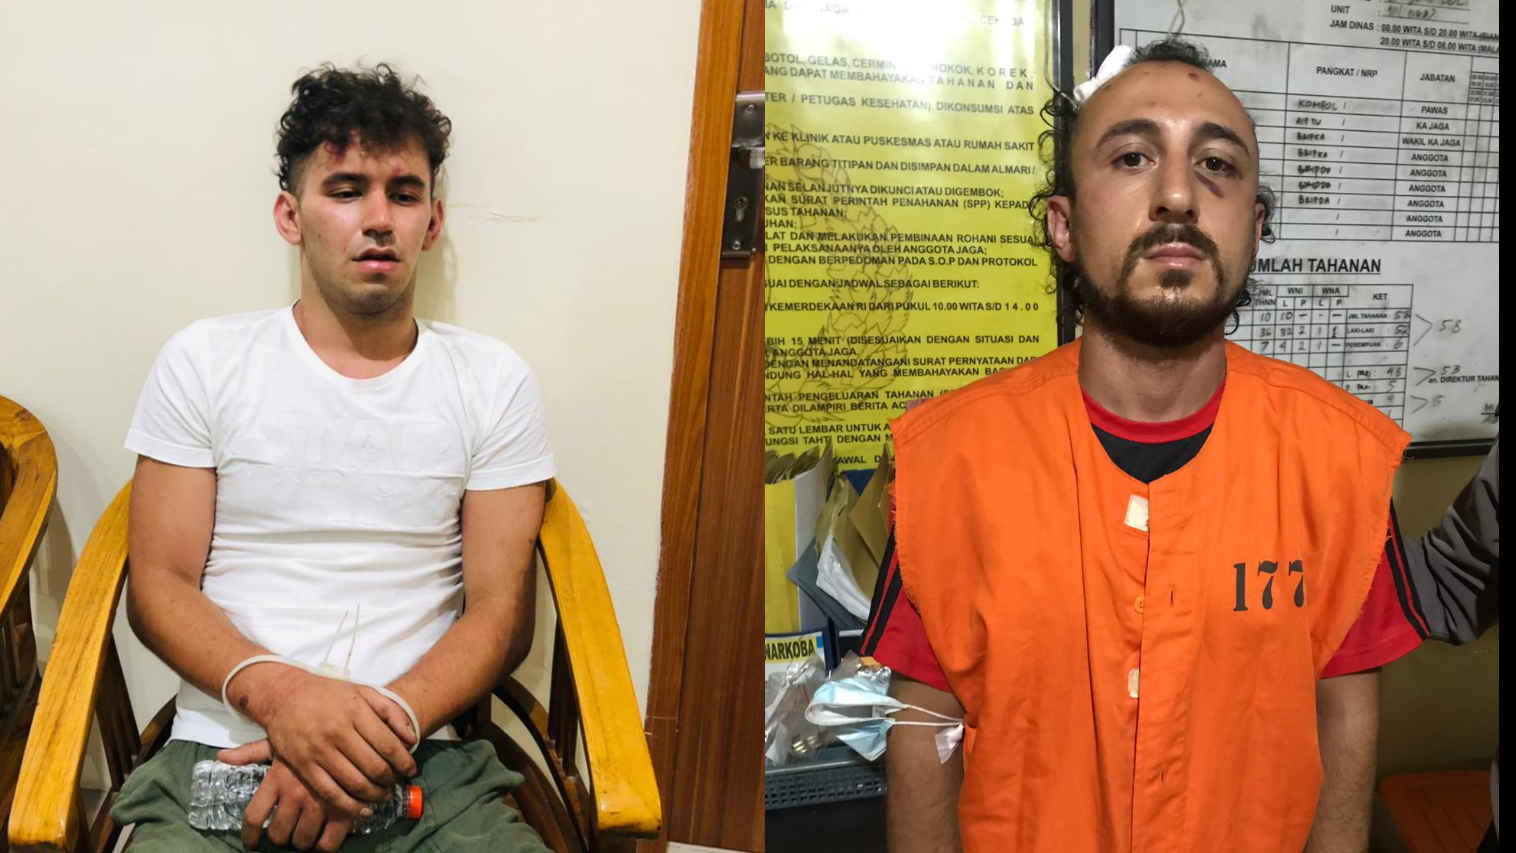 Bobol ATM, Dua WNA Turki Ditangkap Polisi